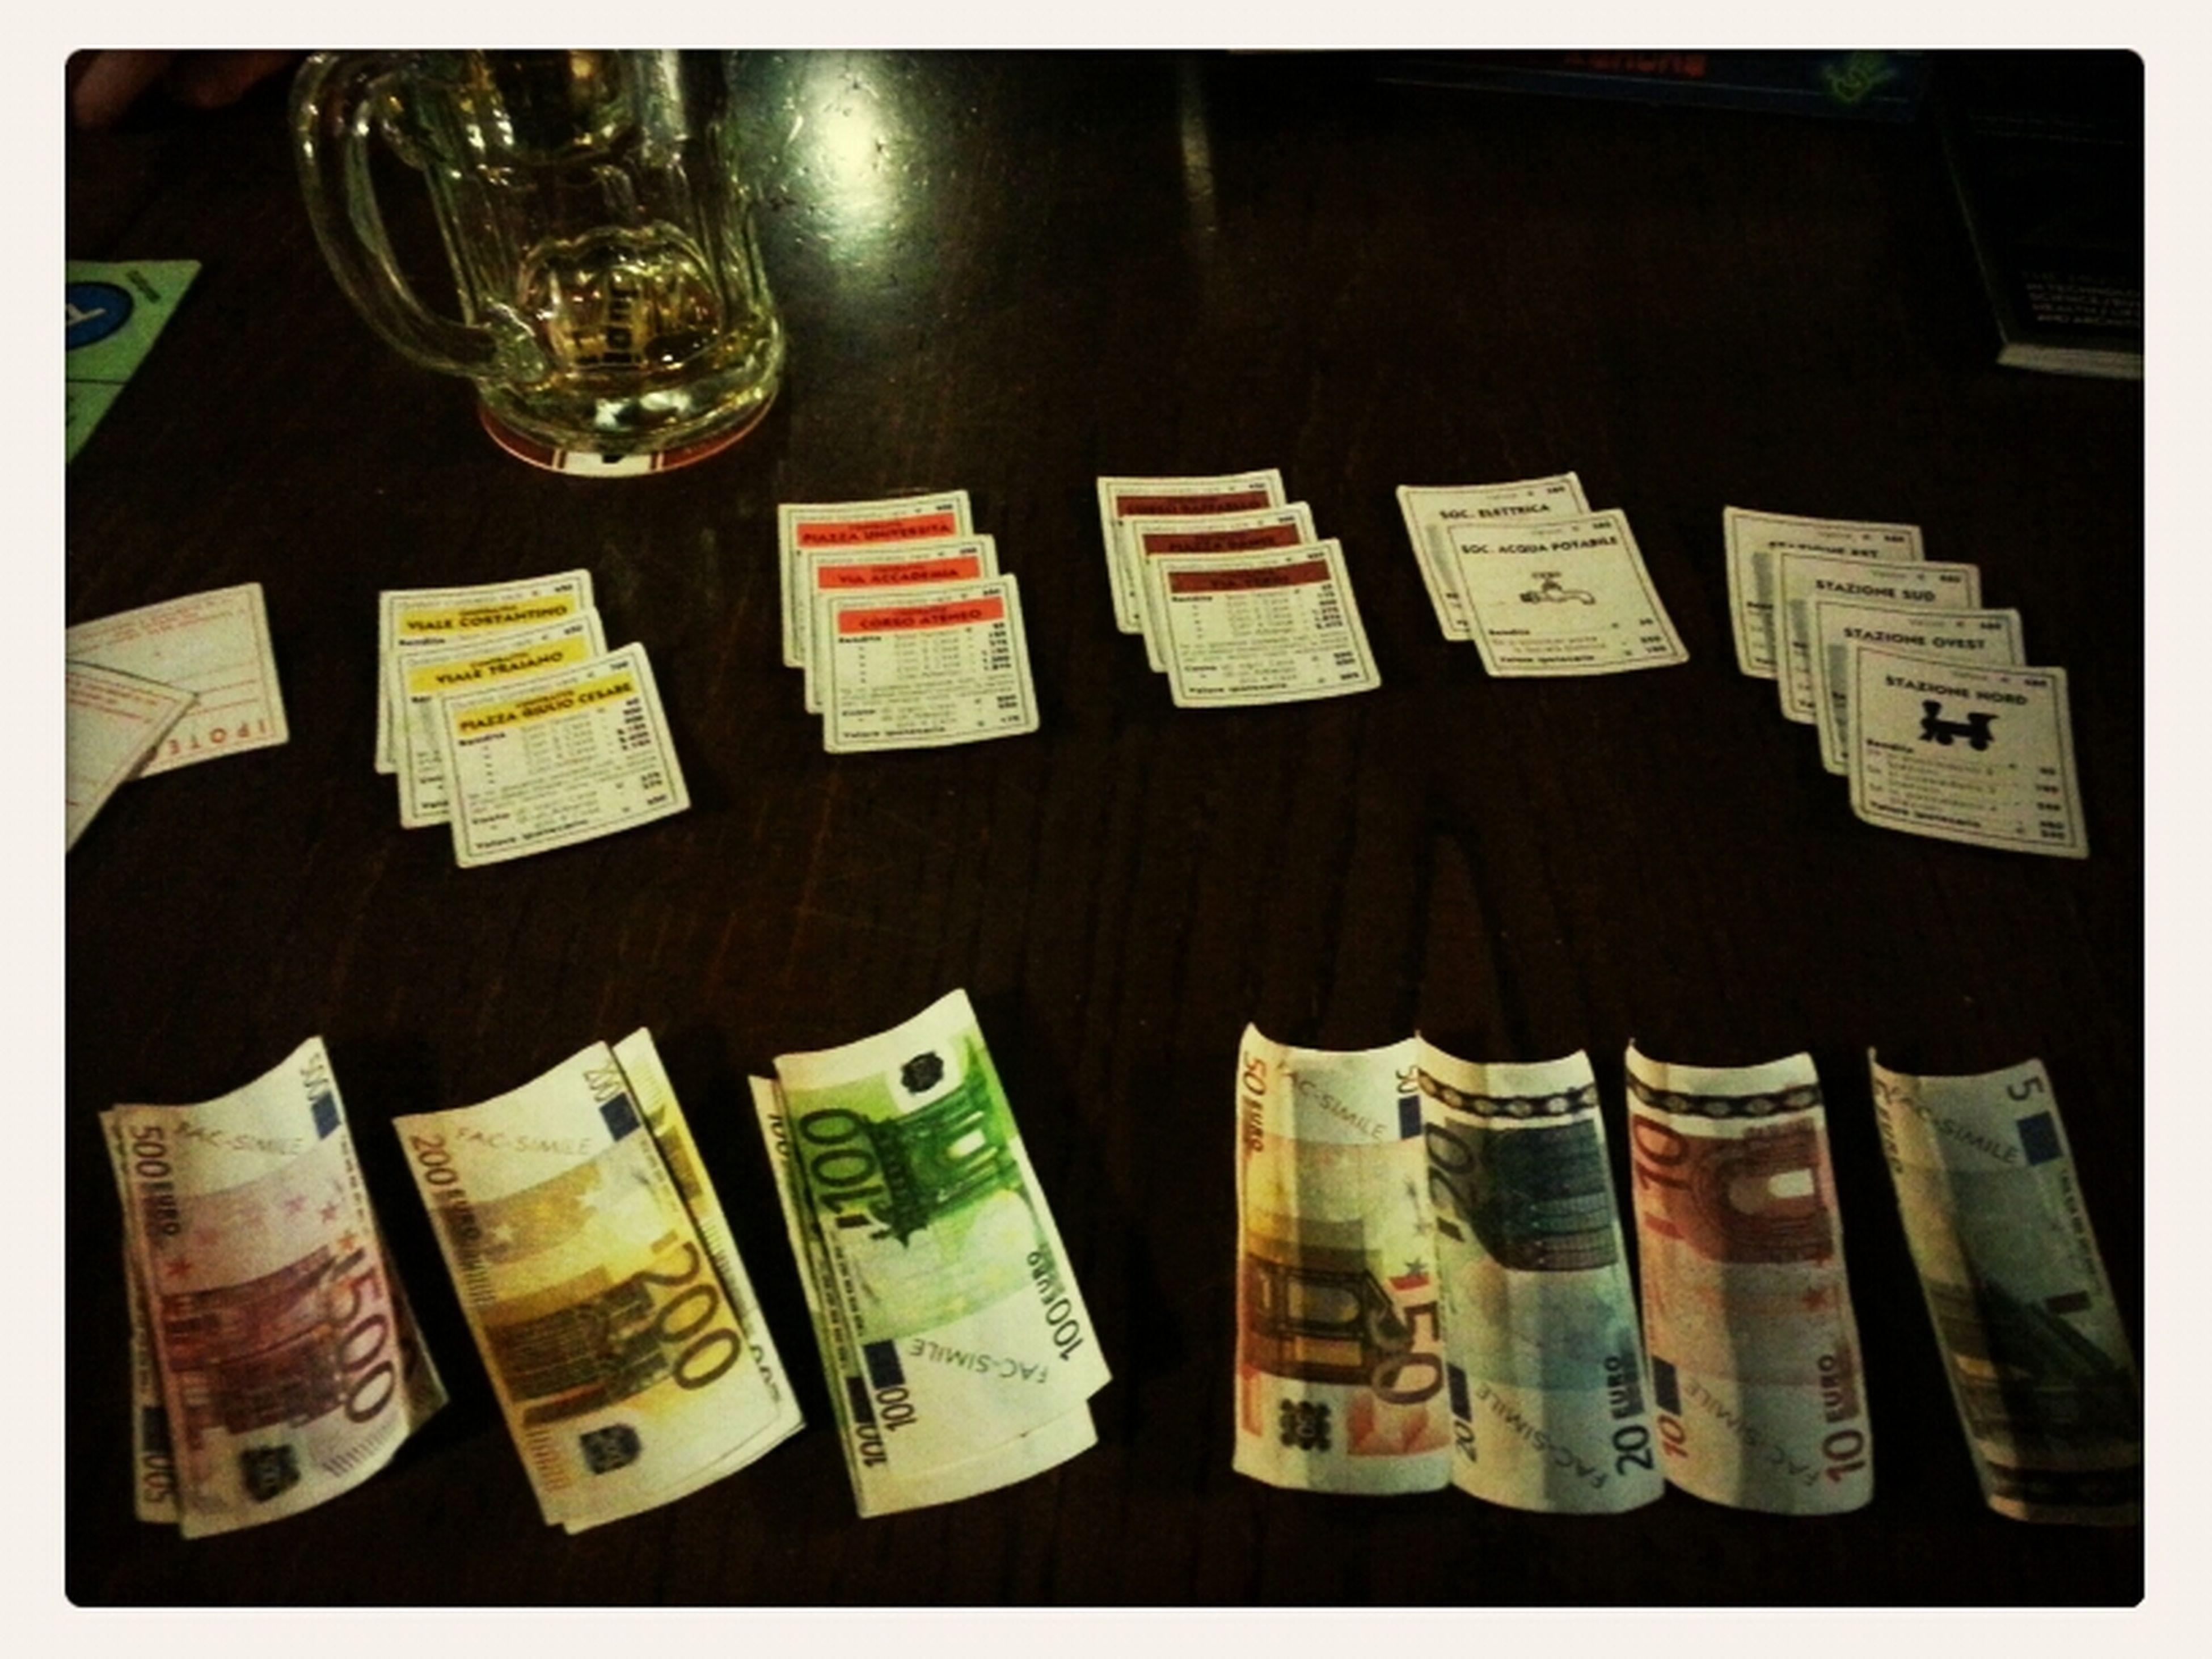 #imprenditorealtop #monopoli #Briatore #Crozza